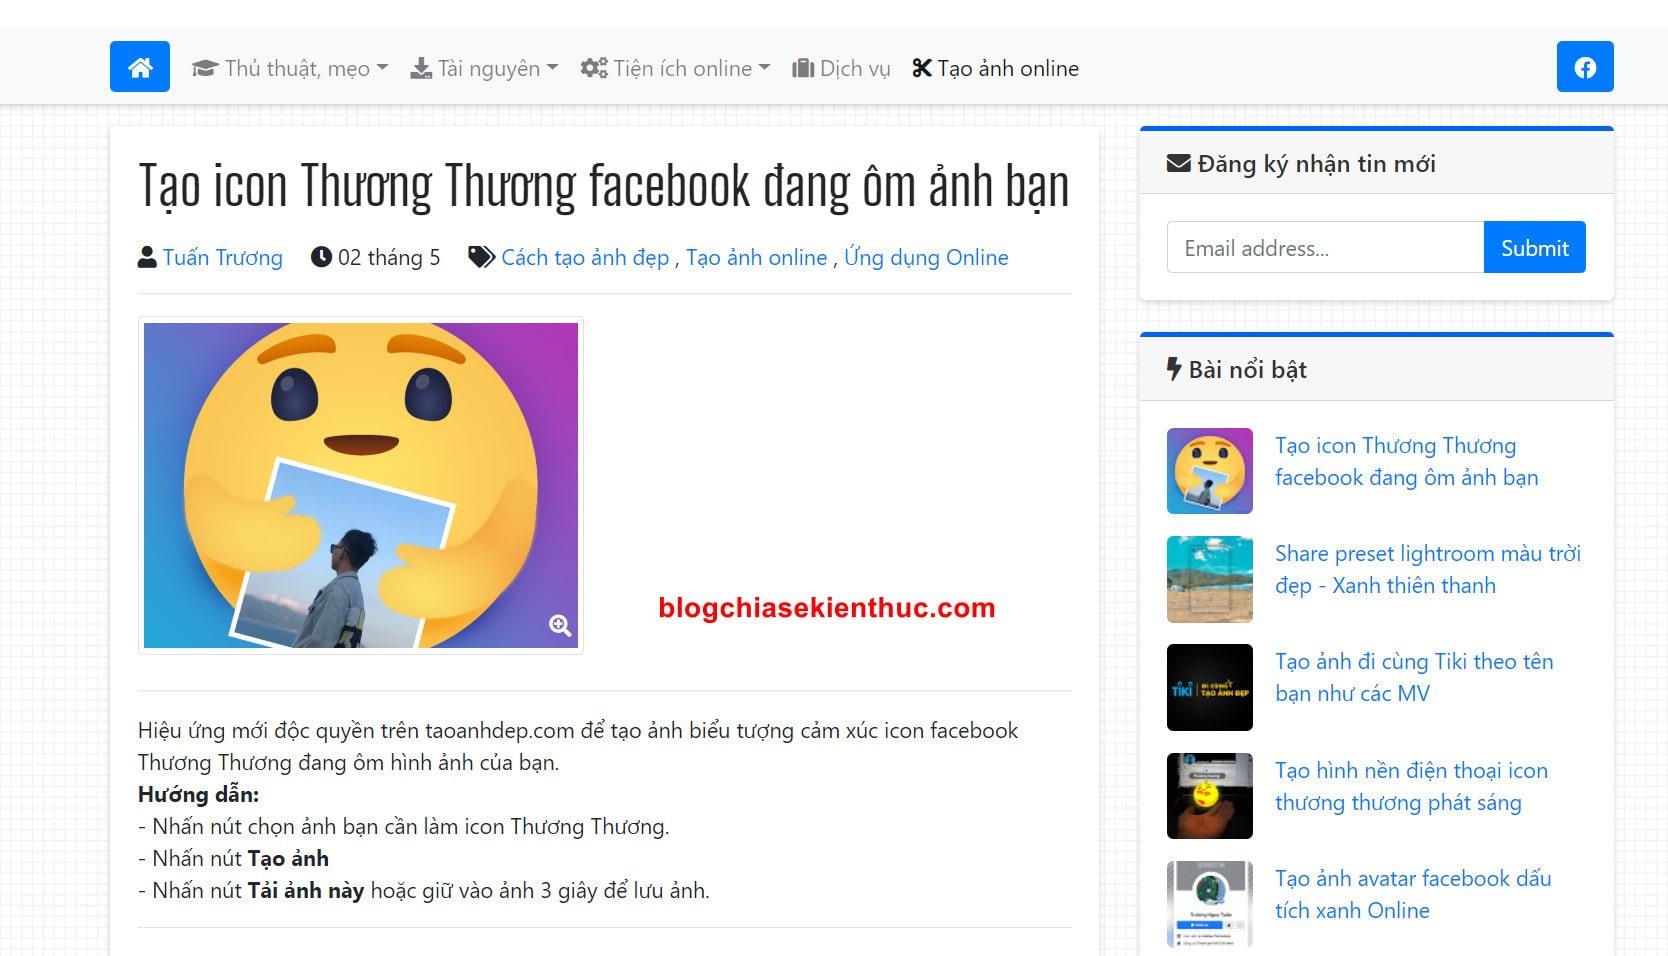 cach-tu-tao-icon-thuong-thuong-cua-rieng-ban (2)